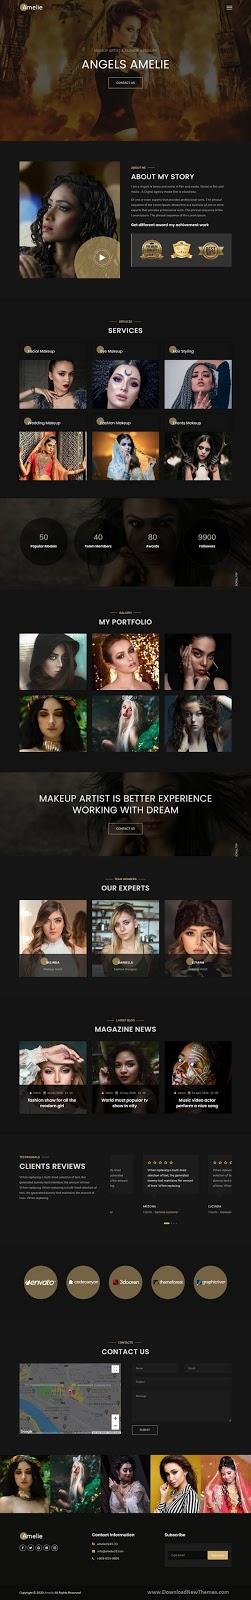 Makeup Artist & Model Portfolio Template